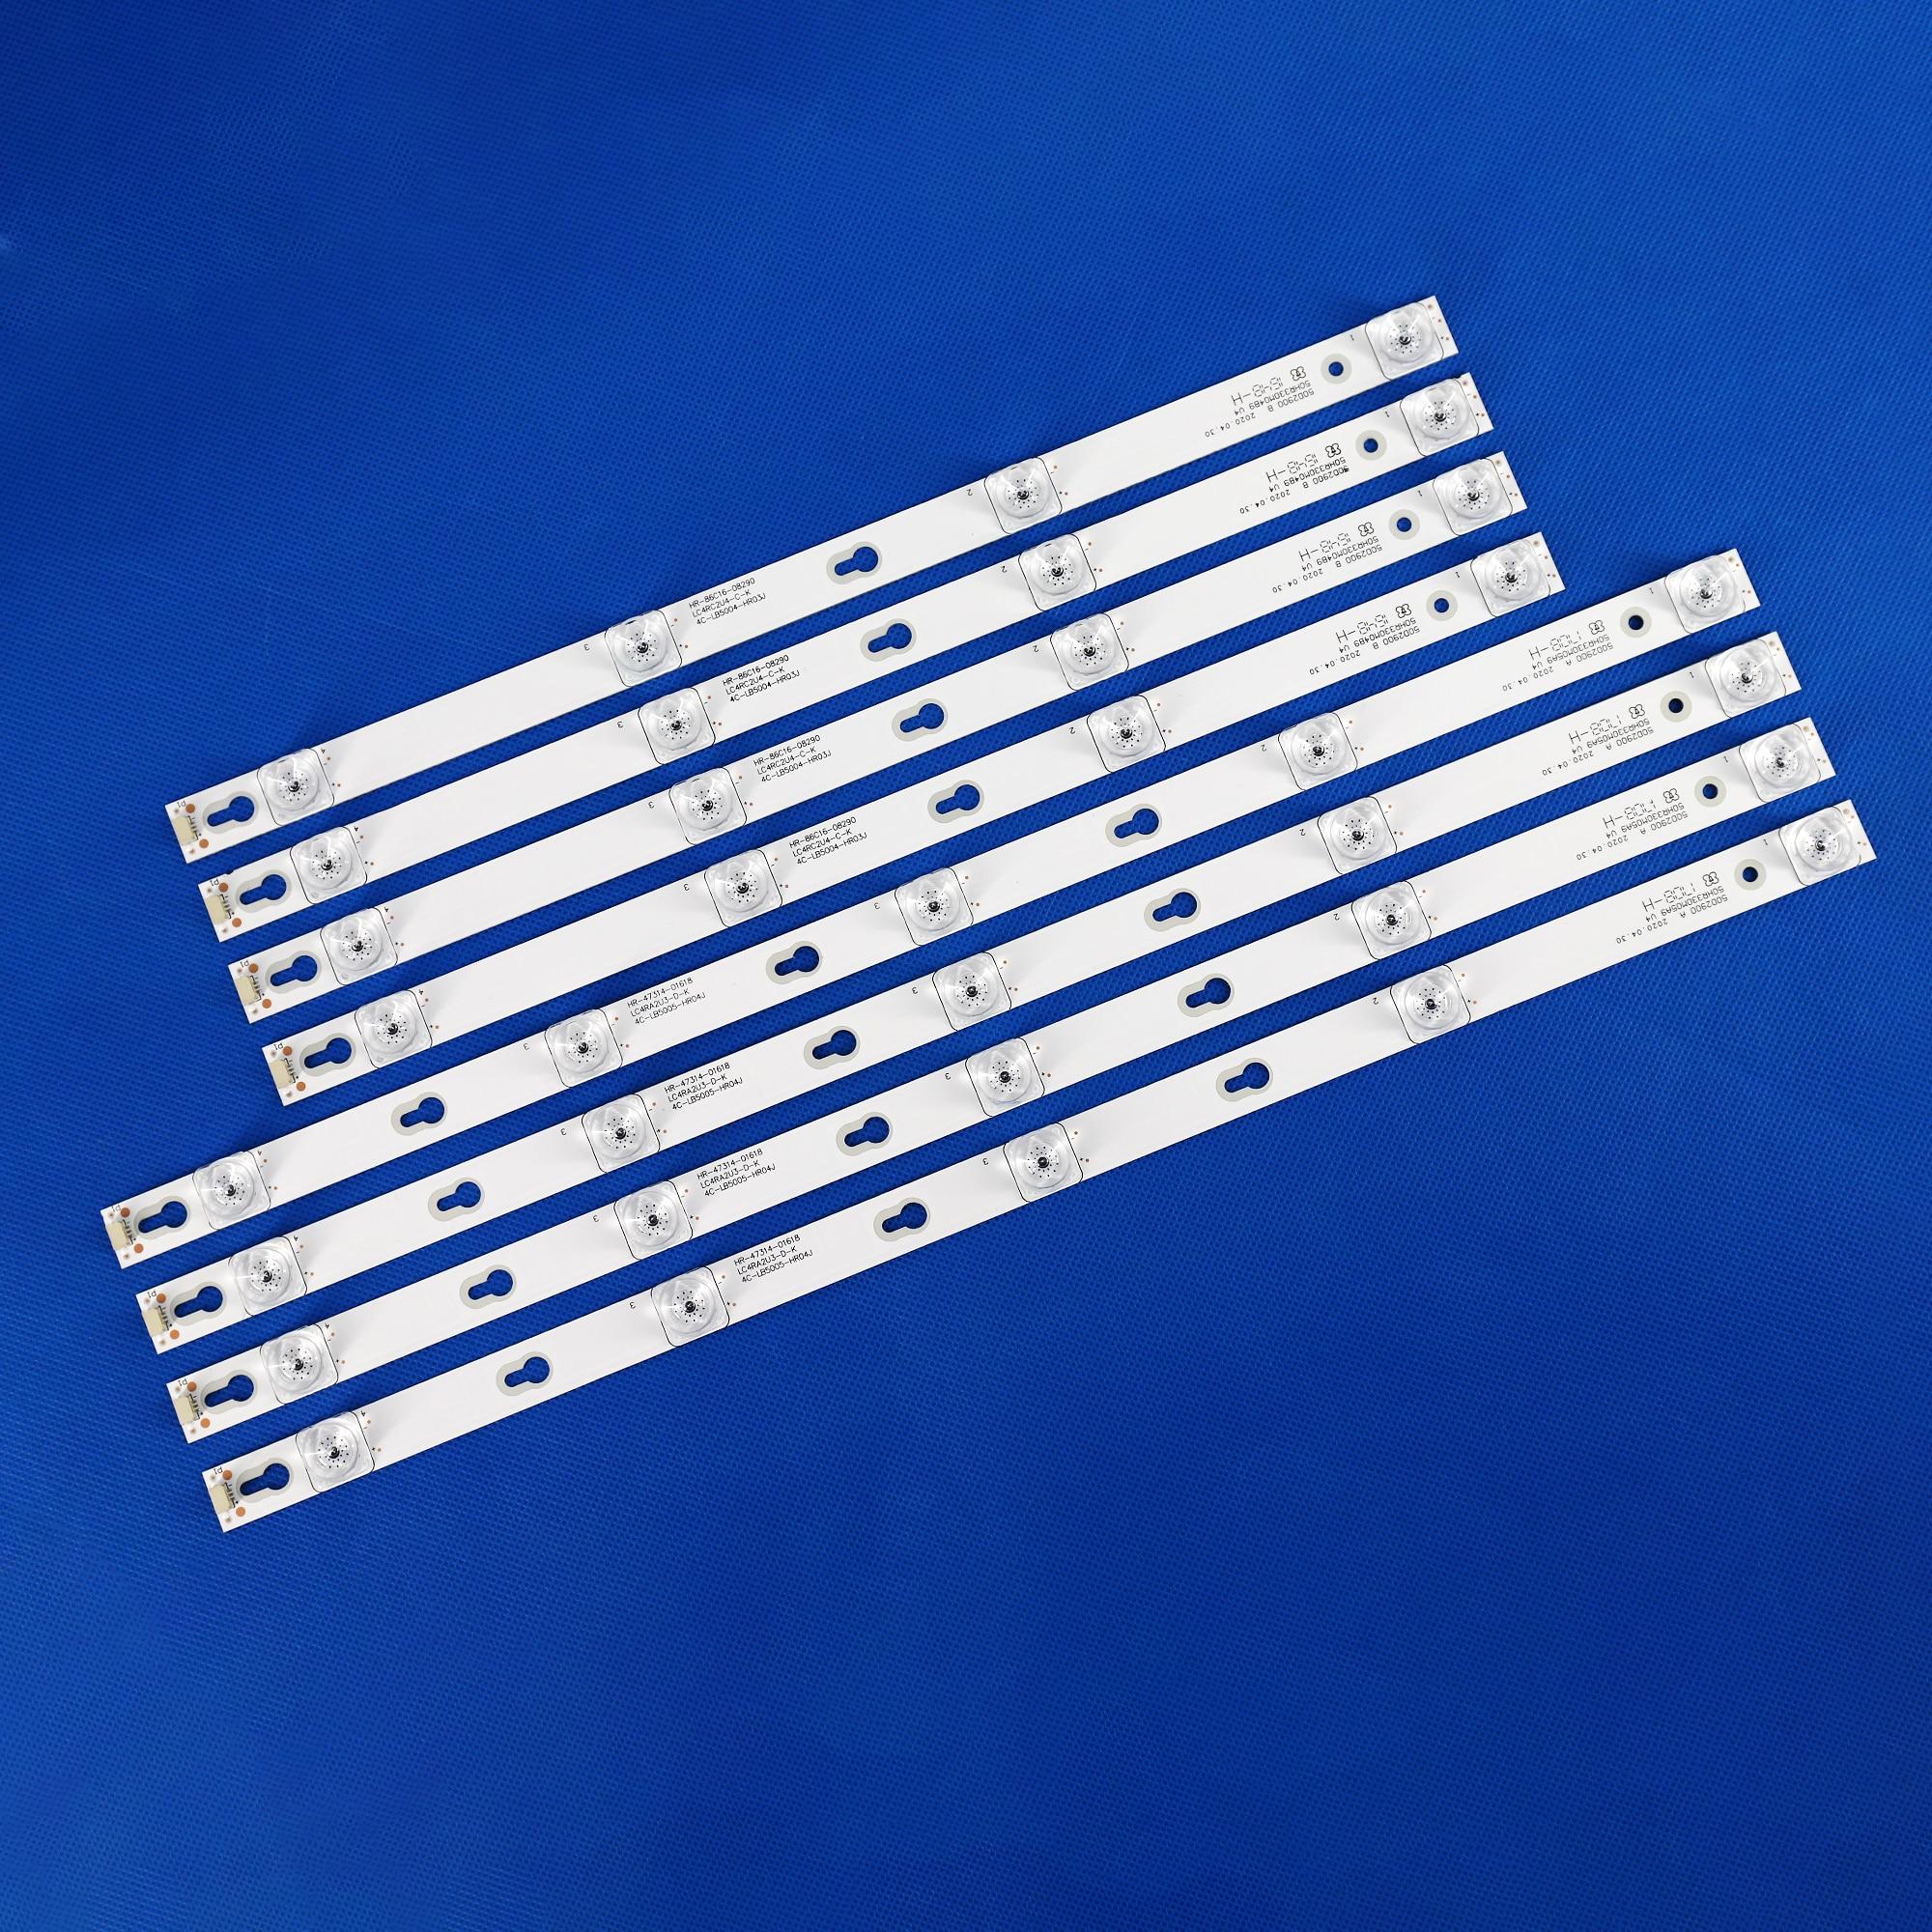 LCD شريط إضاءة خلفي ل TCL D50A630U L50E5800A-UD 50D2900 50HR330M05A9 50HR330M04A9 4C-LB5004-HR13J 4C-LB5005-HR03J